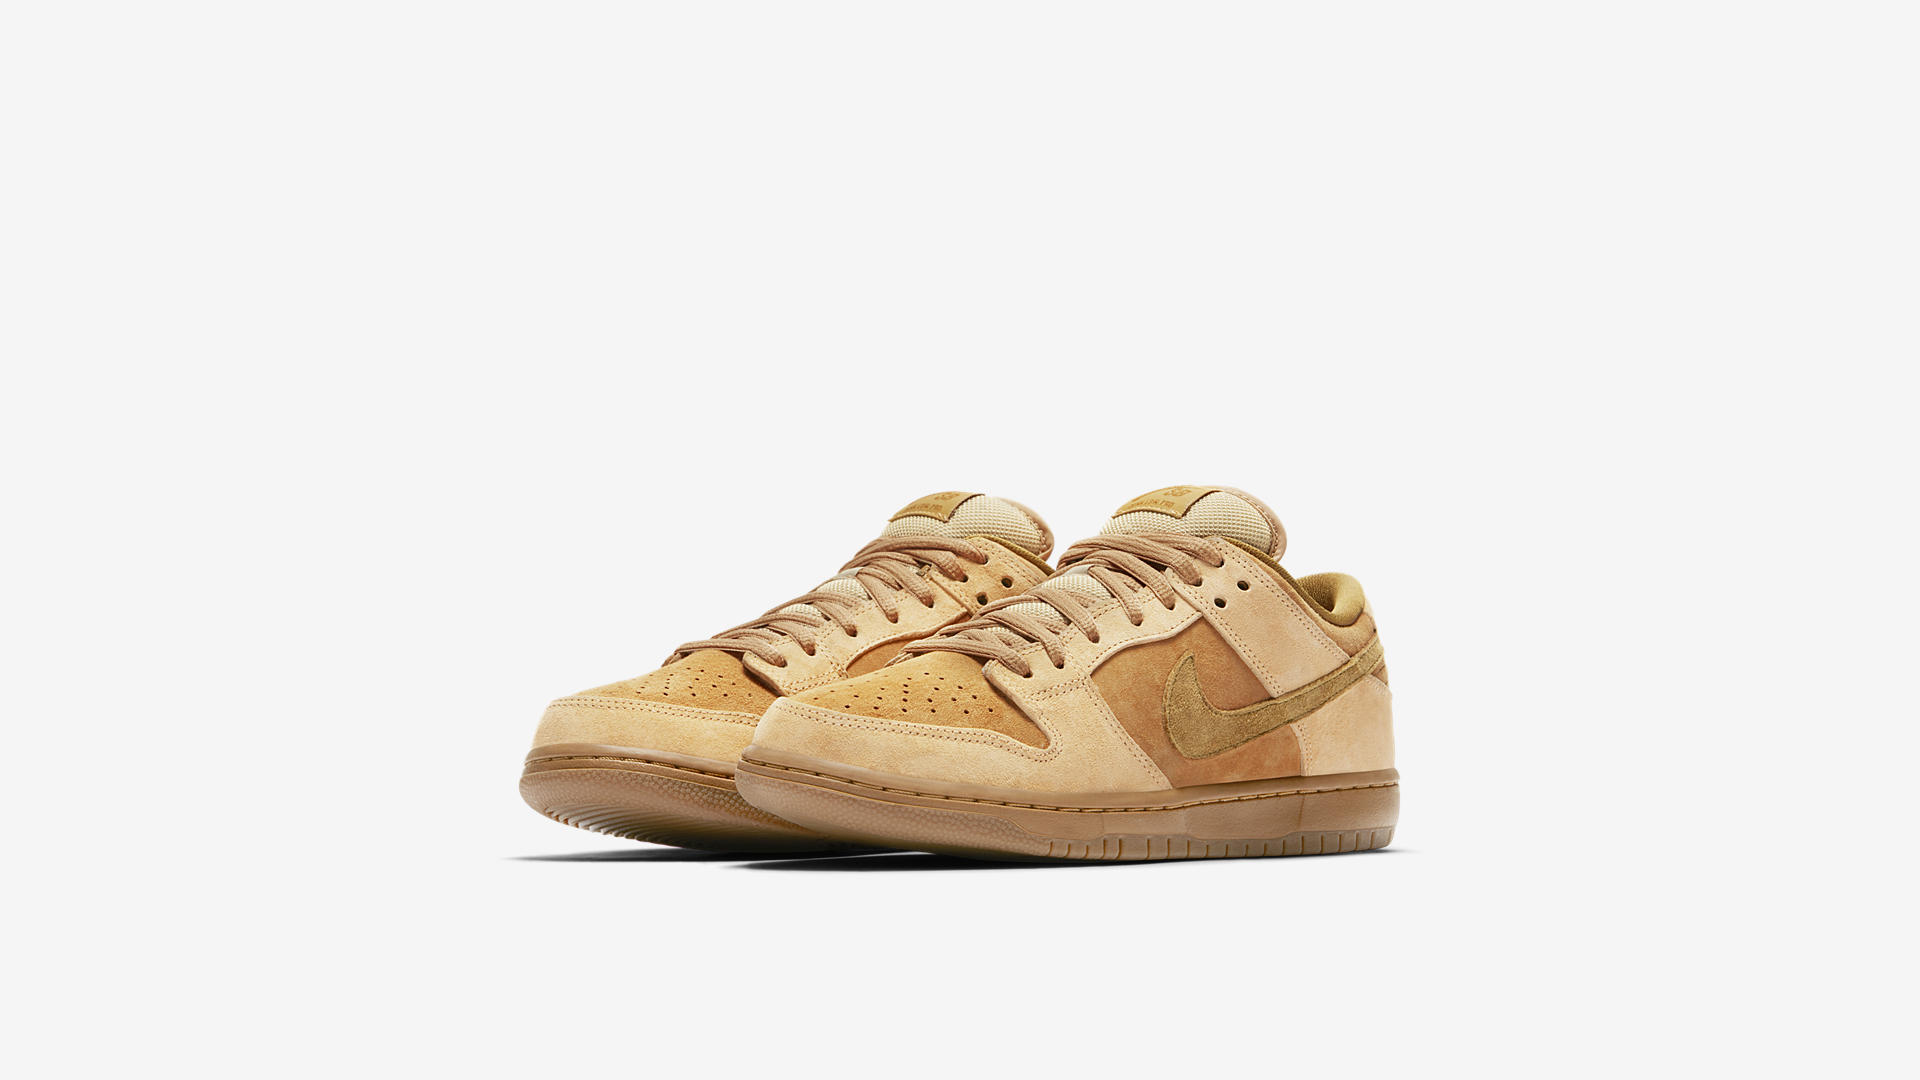 Nike SB Dunk Low Pro Wheat 883232 700 4